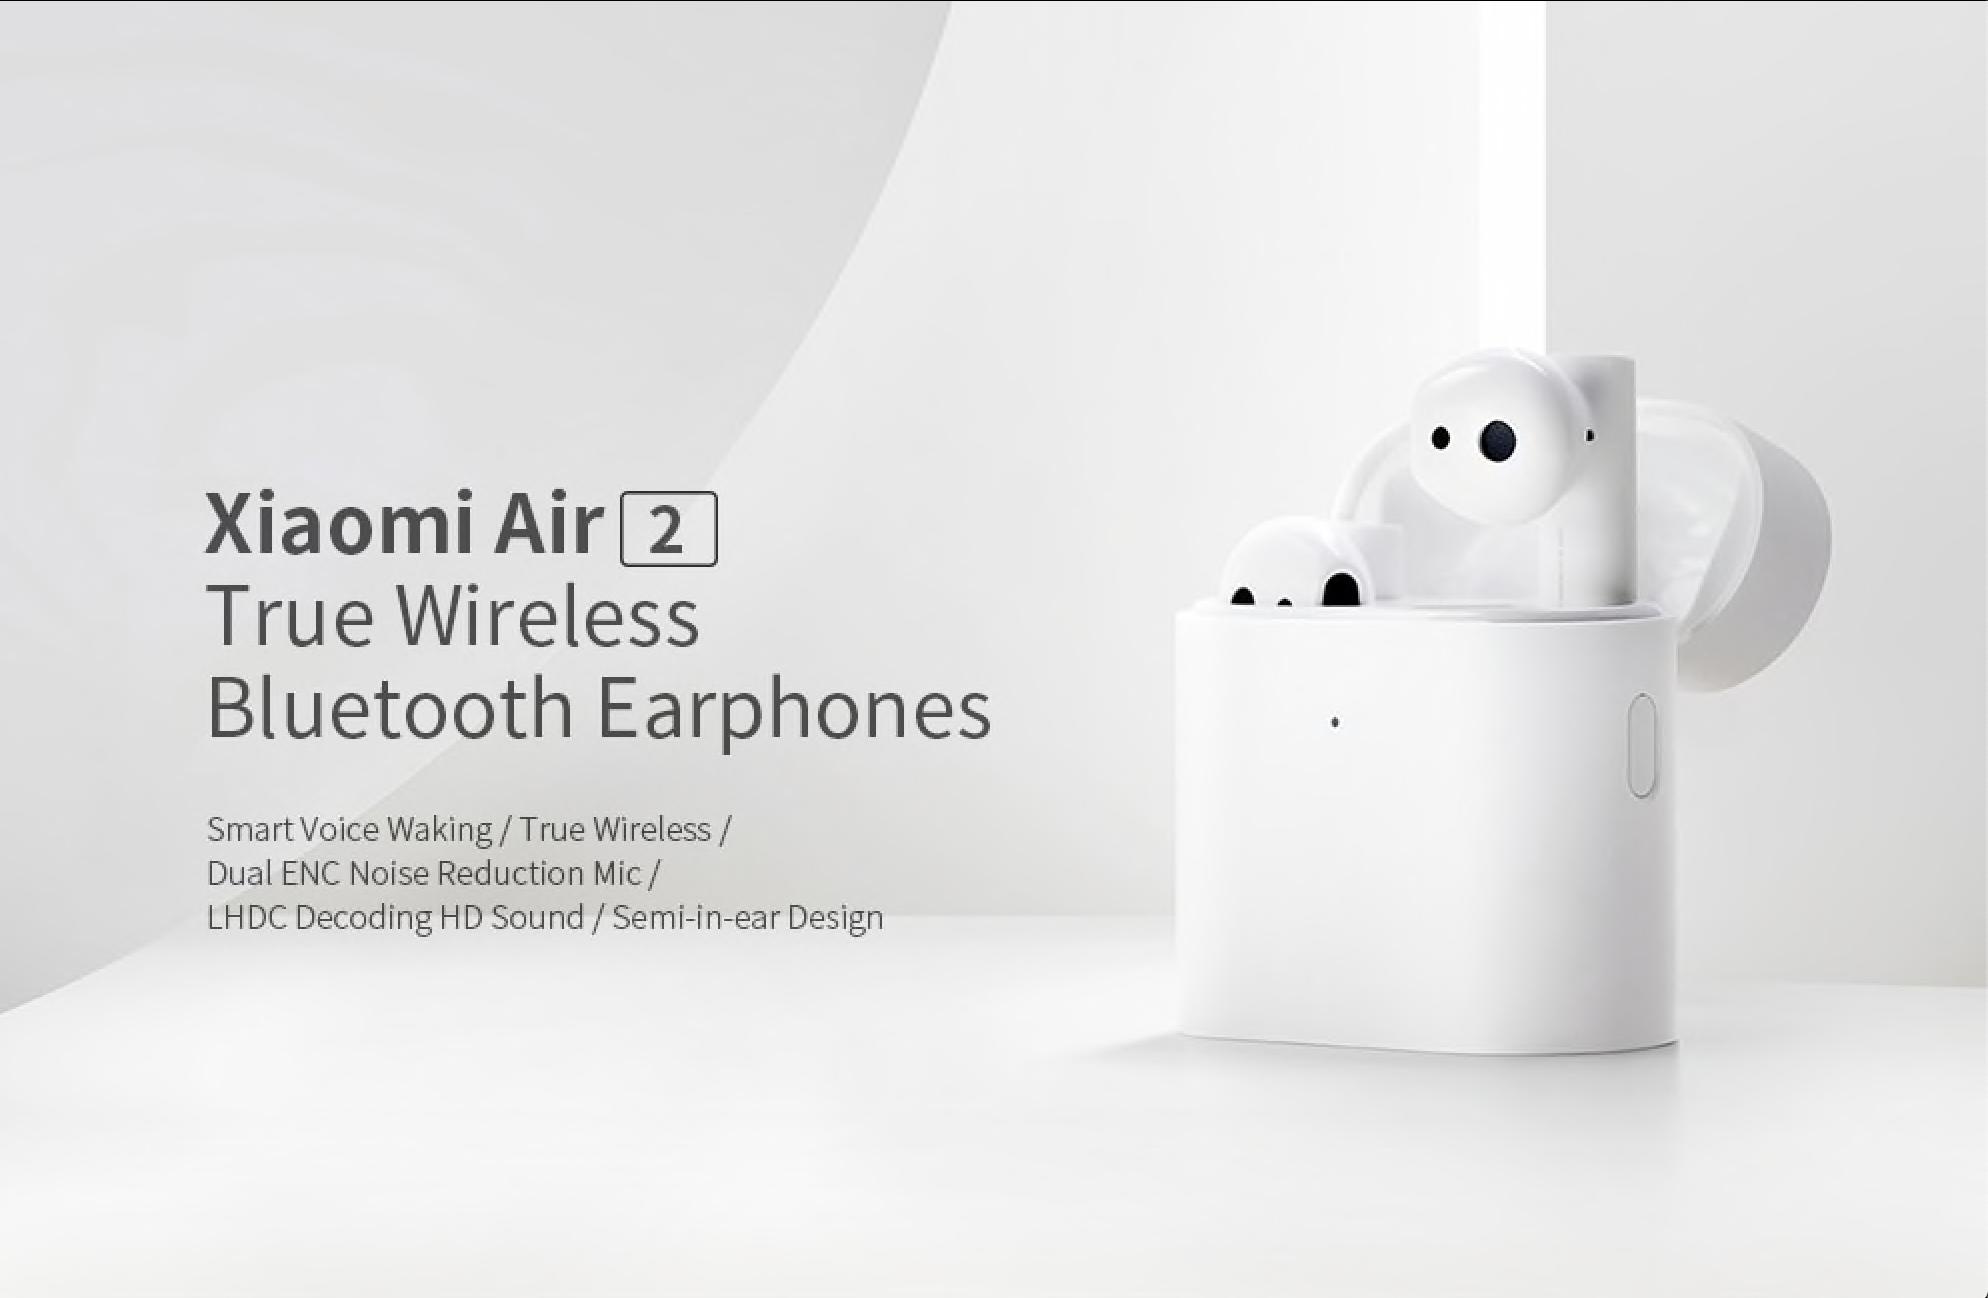 Bezdrátová sluchátka a Xiaomi televizor v akci! [sponzorovaný článek]